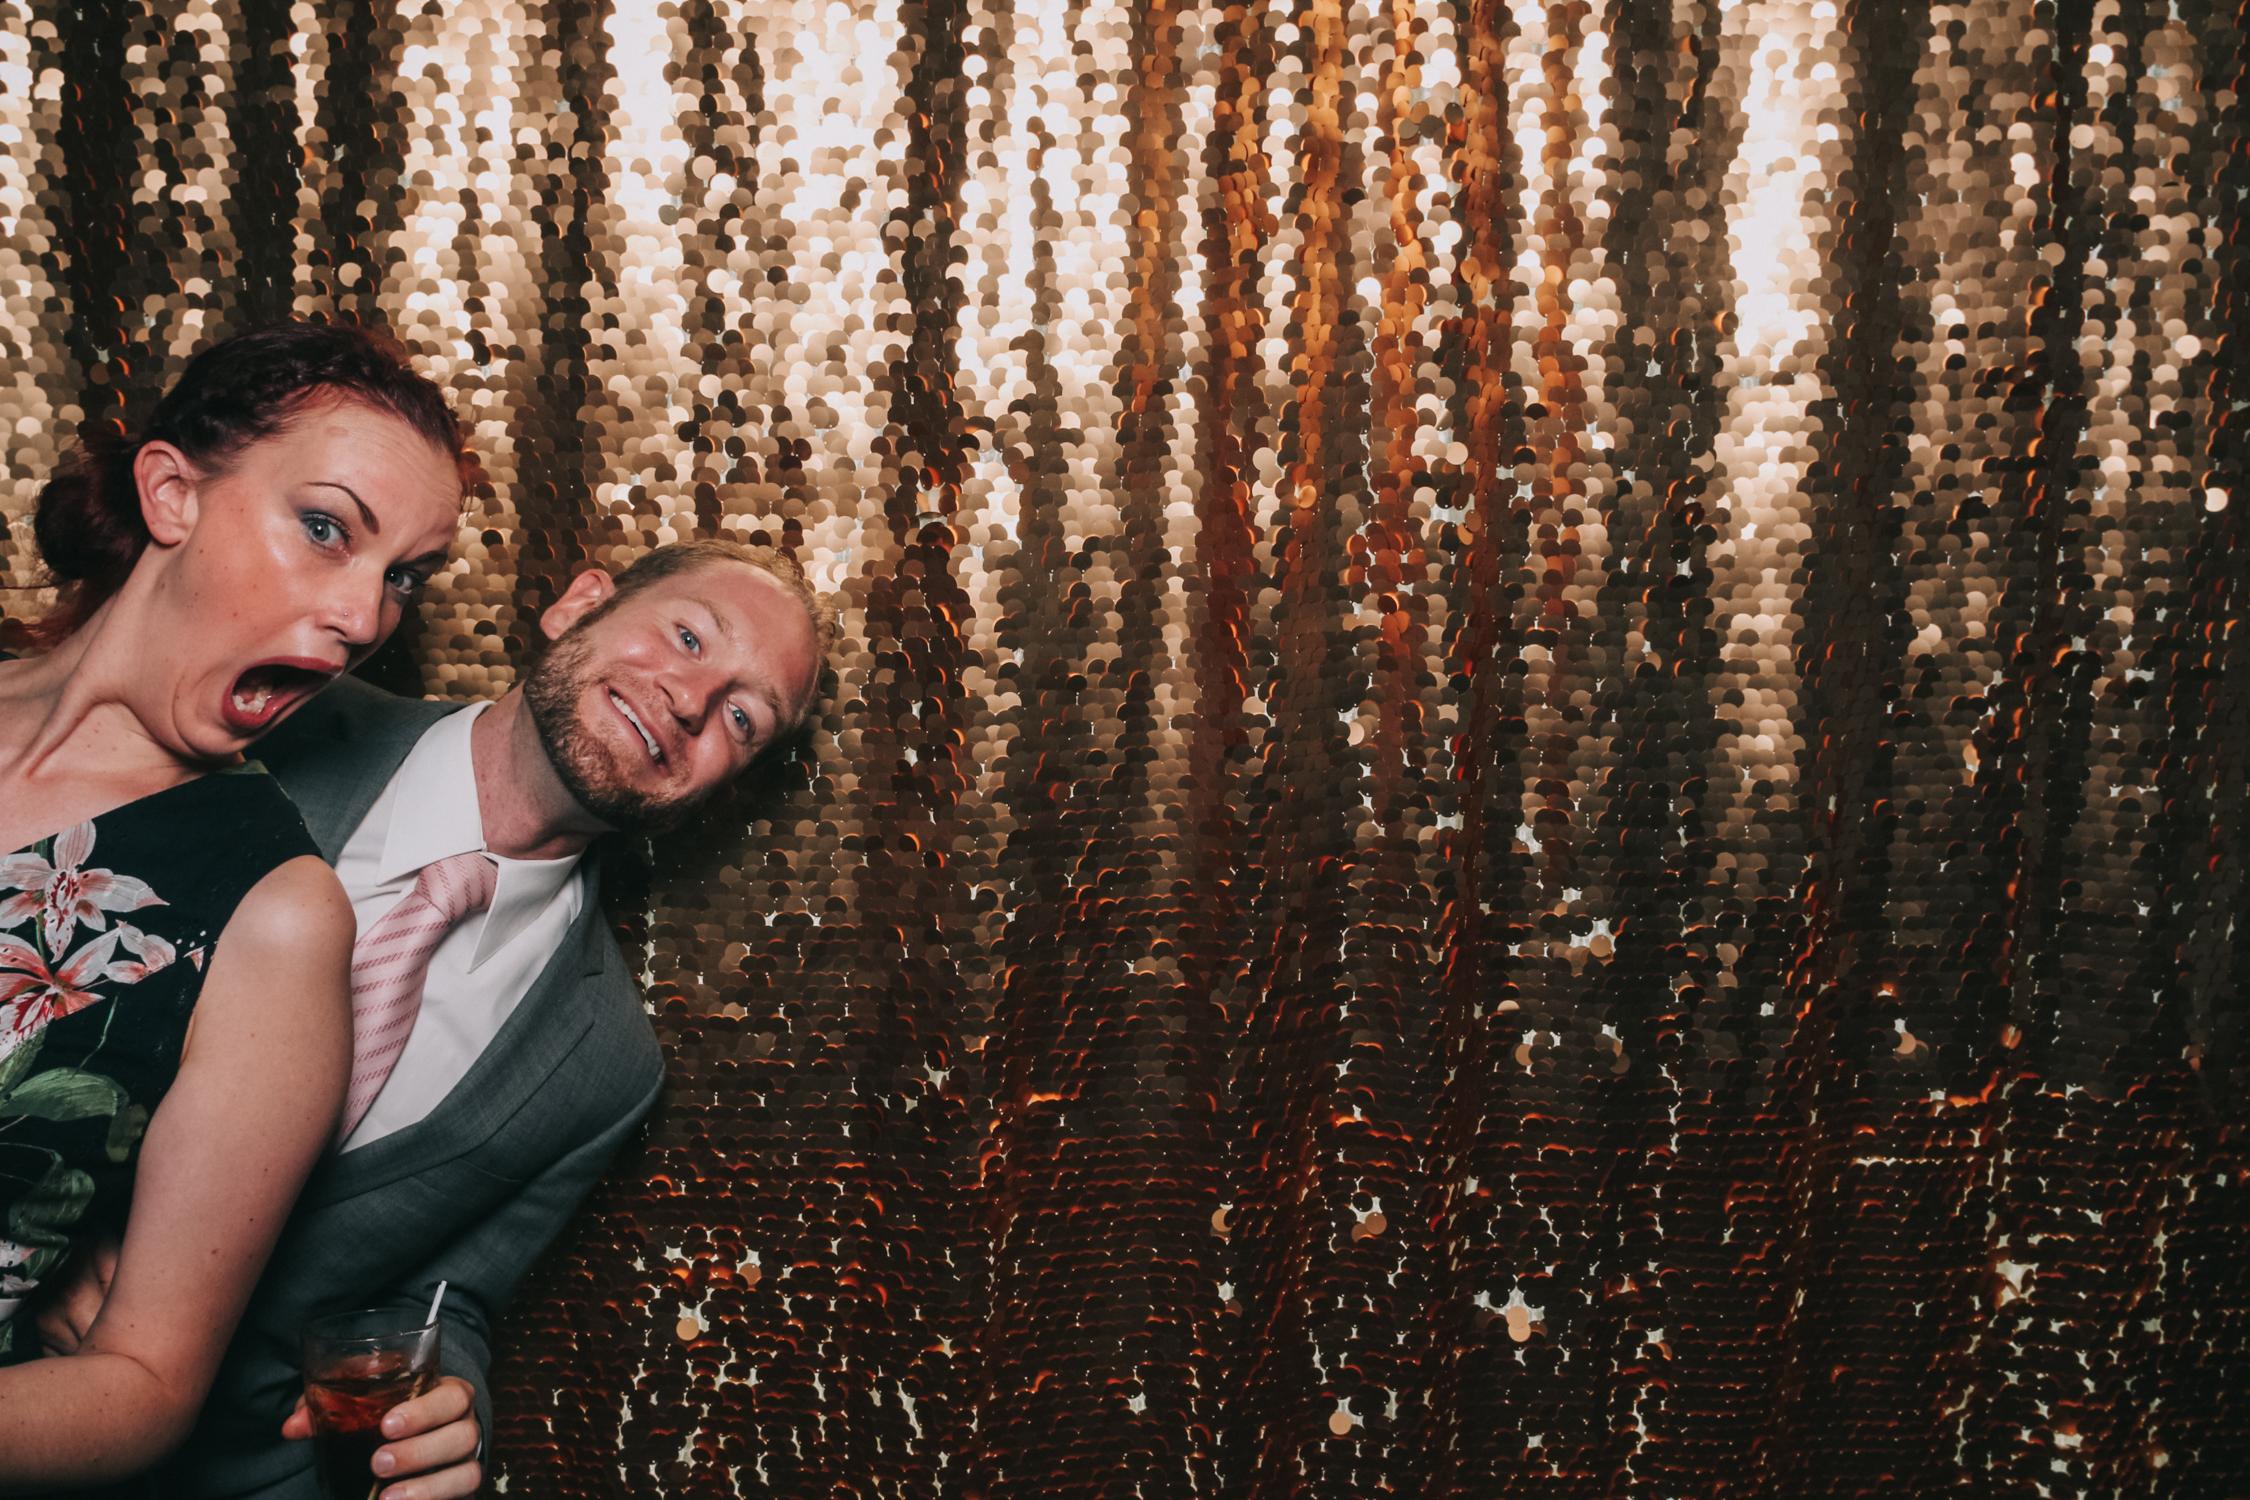 baltimore rusty scupper wedding photo booth-5.jpg